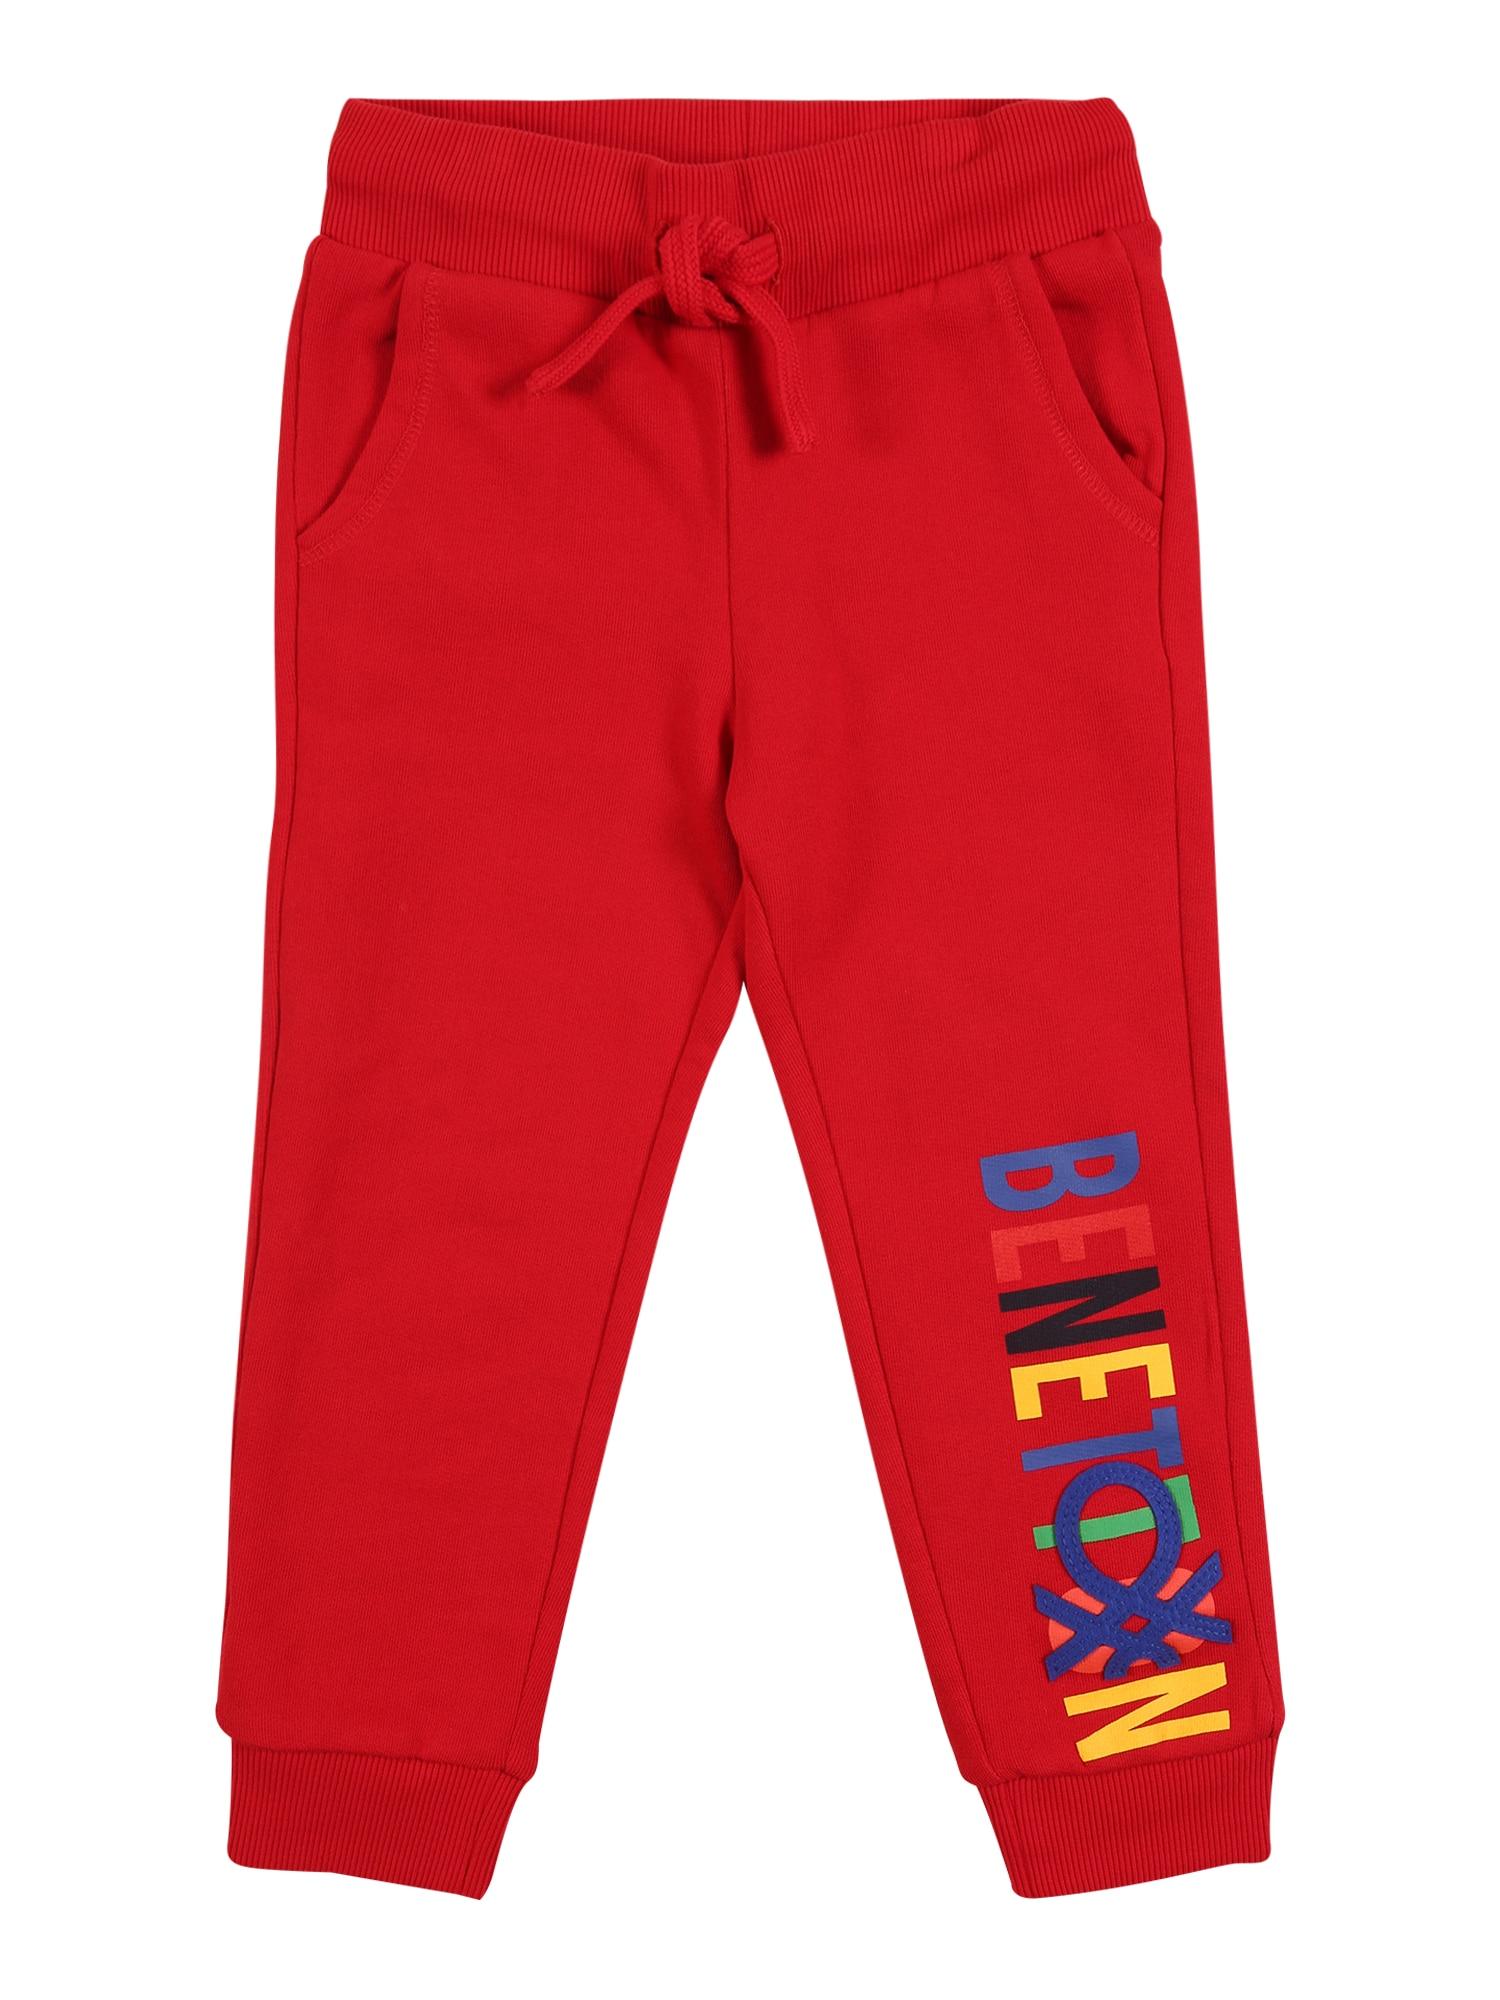 UNITED COLORS OF BENETTON Kelnės raudona